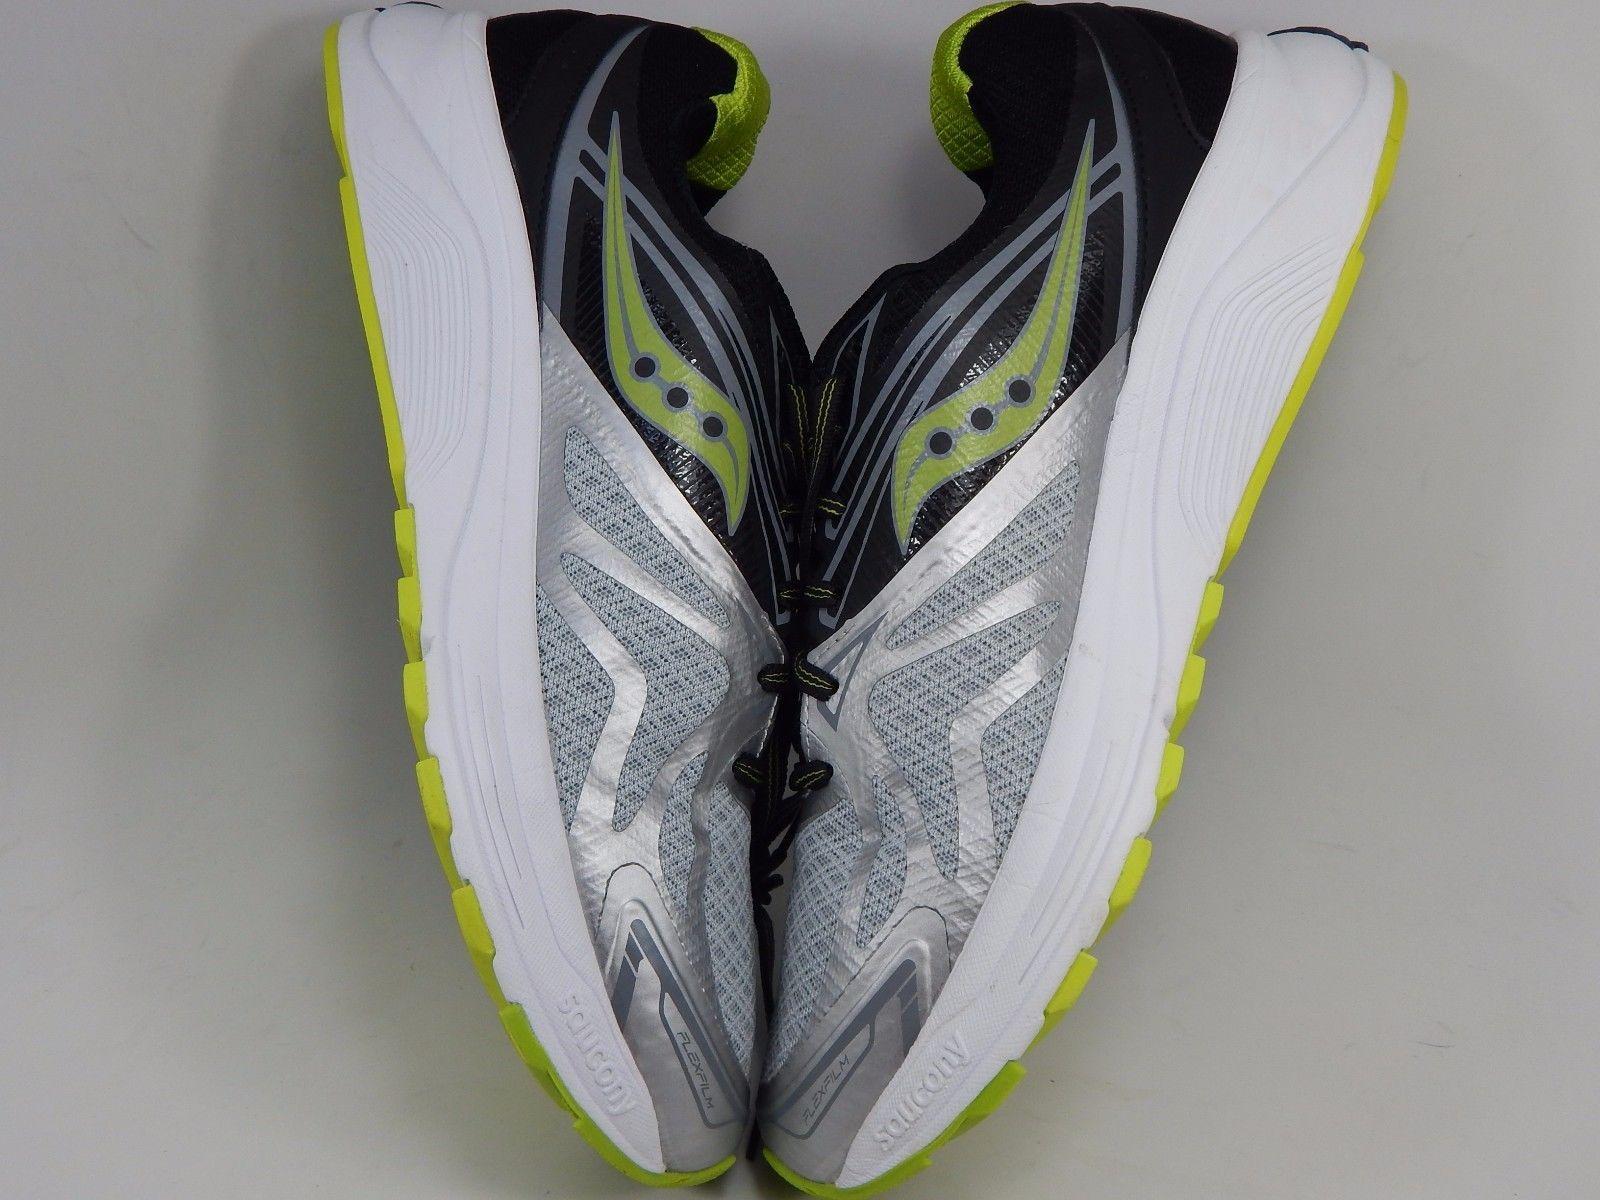 Saucony Ride 9 Men's Running Shoes Size US 10 M (D) EU: 44 Silver S20318-6